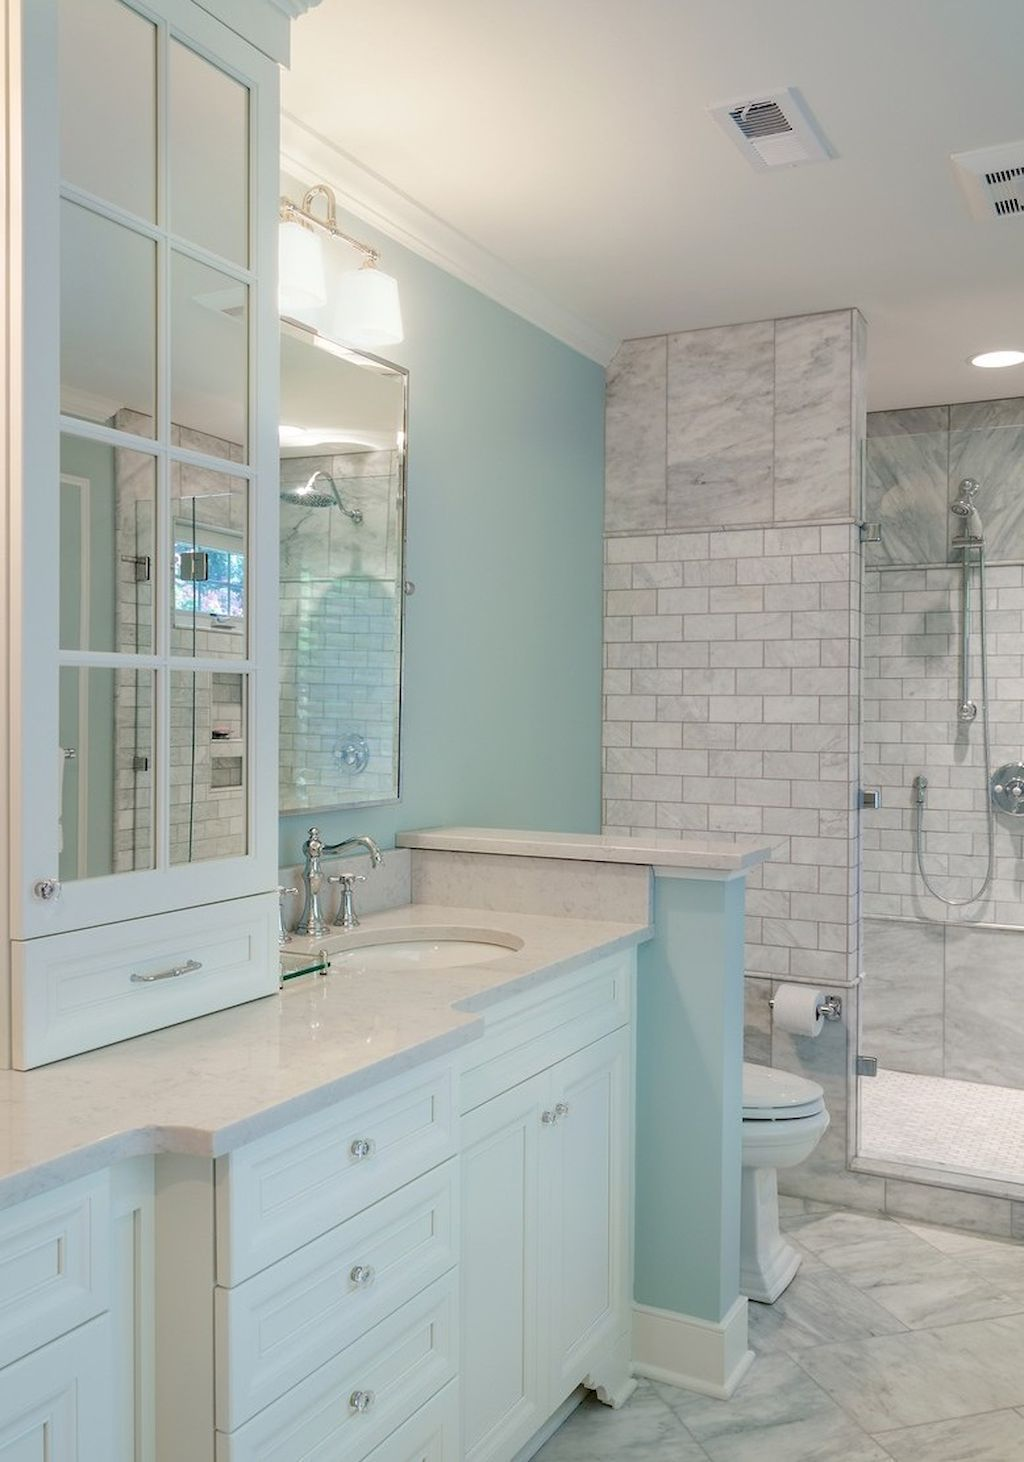 Coastal Beach House Bathroom Remodel Designs (62)   Beach House Bathroom, House Bathroom, Bathroom Remodel Designs